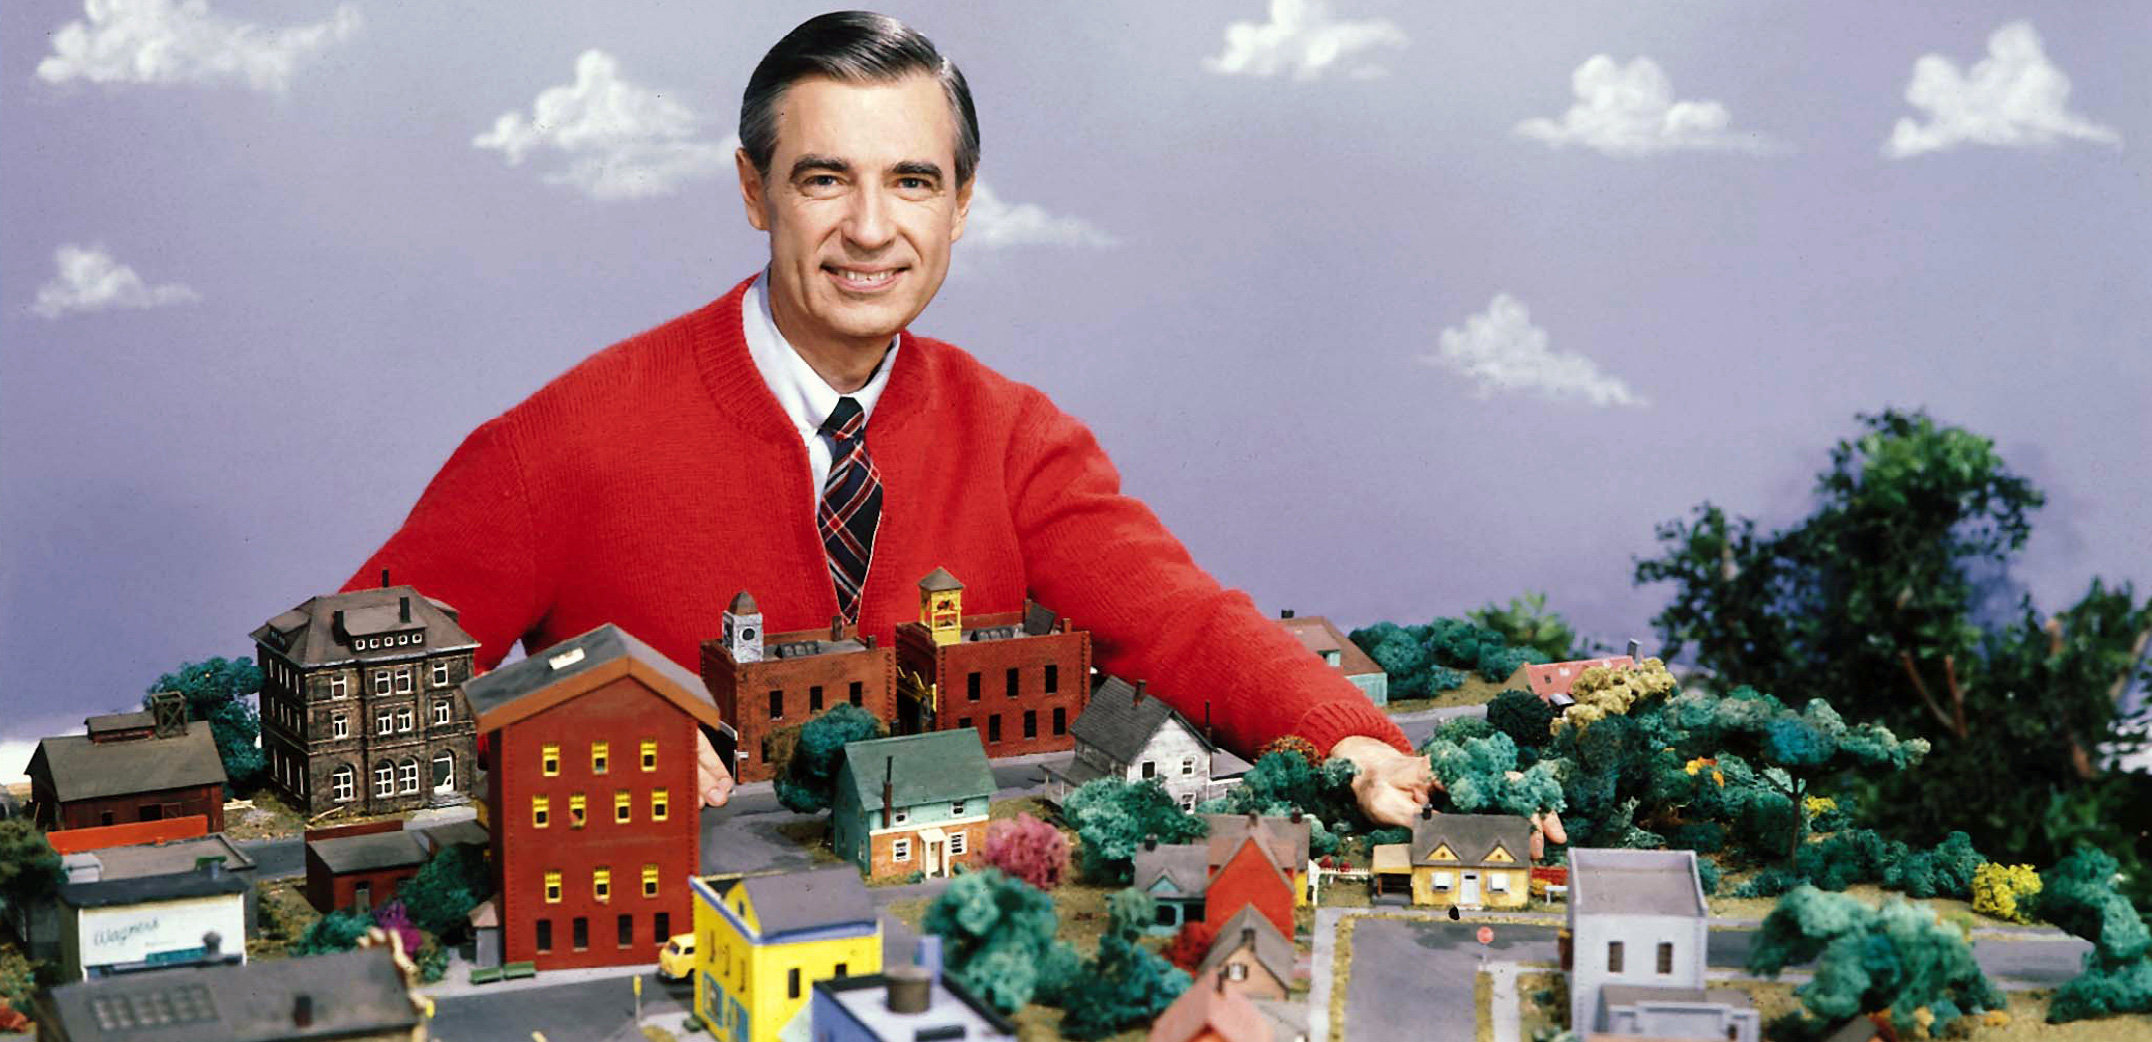 Mister-Rogers-with-model-neighborhood-(color).jpg